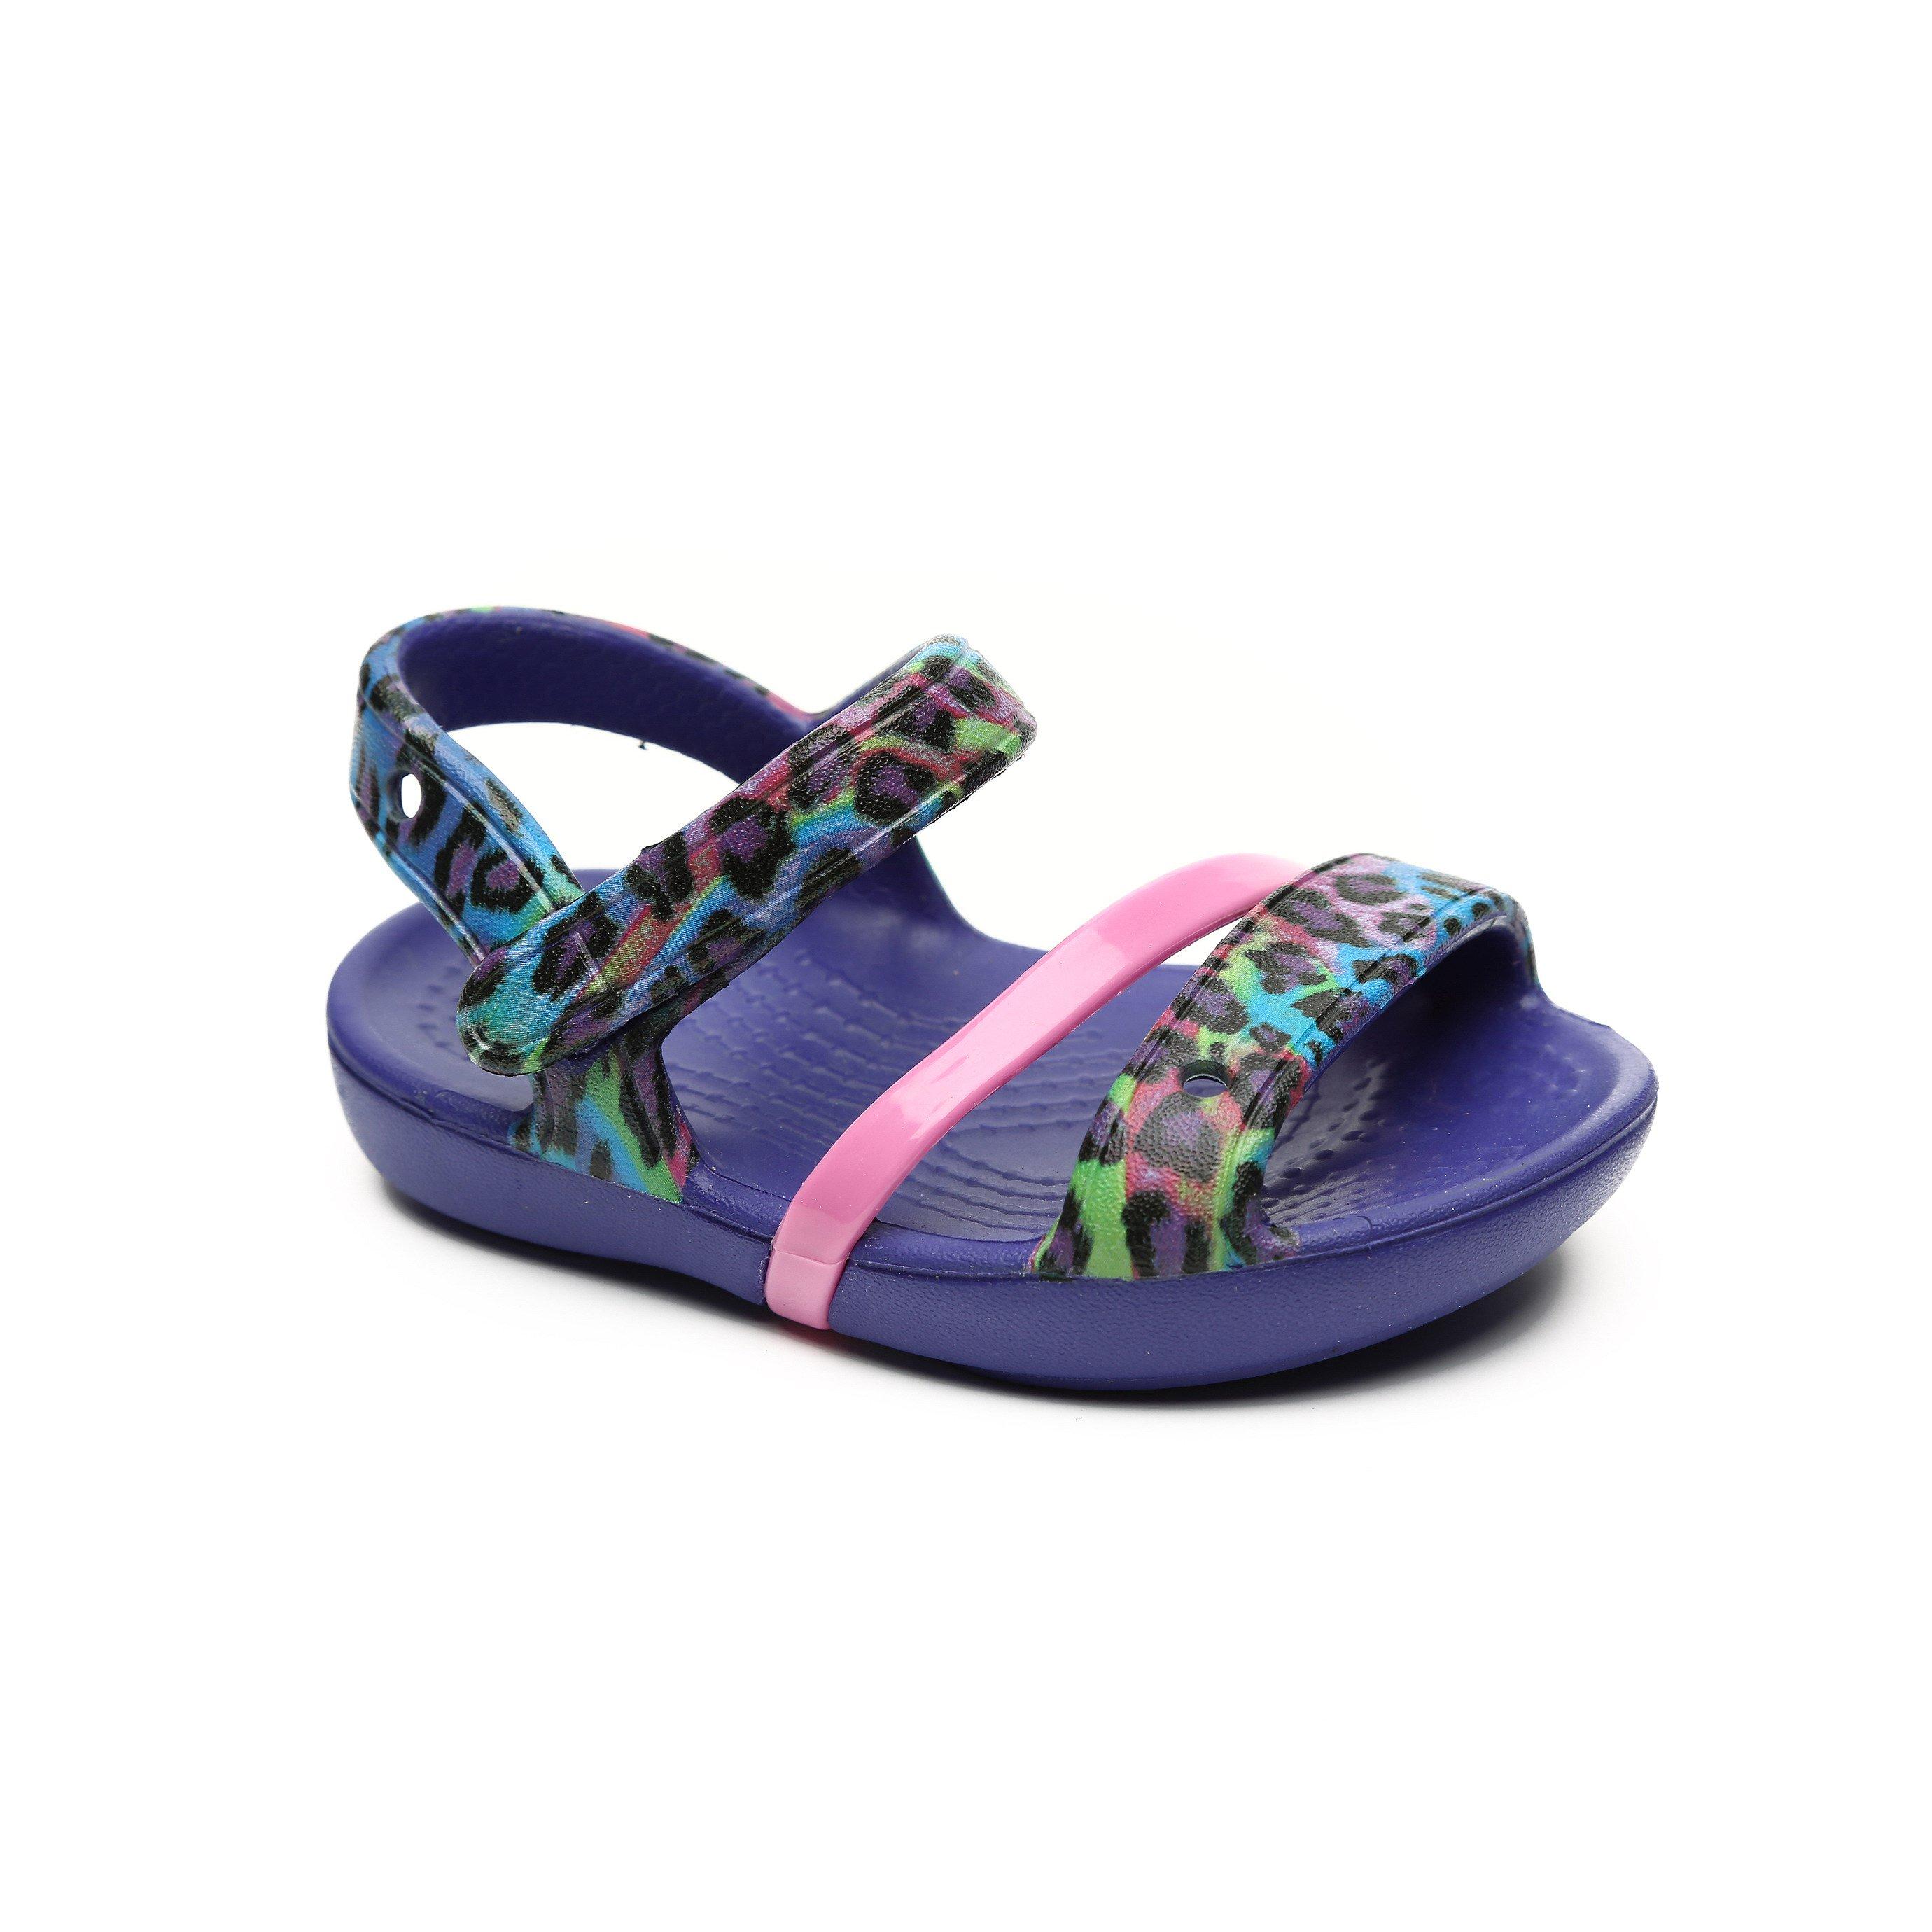 Crocs Lina Sandal - סנדל לילדות בעיטור מנומר בצבע סגול